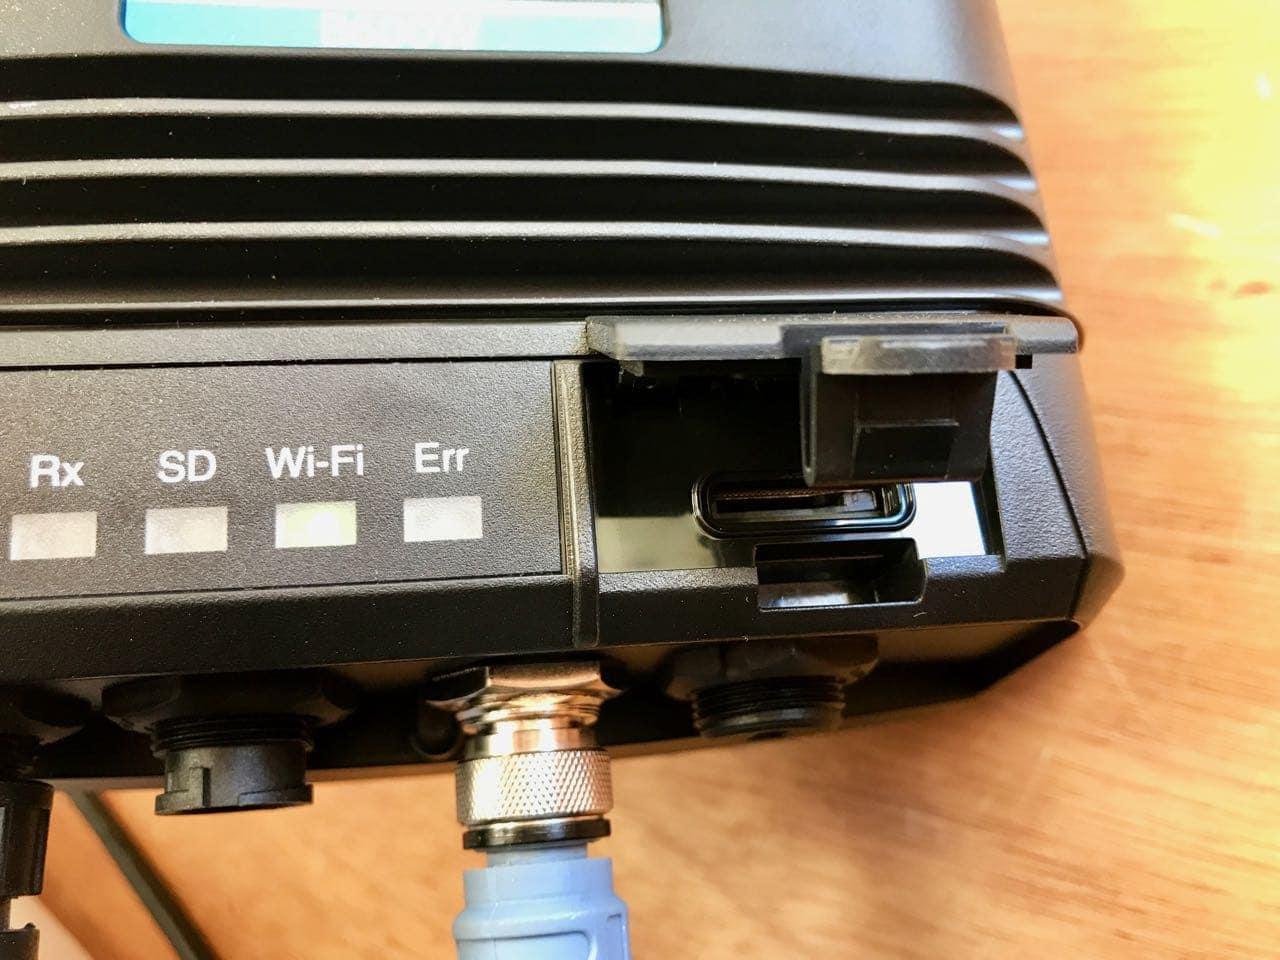 AMEC-WideLink-B600-CLASS-B-SOTDMA-AIS-TRANSPONDER-SD-card-slot